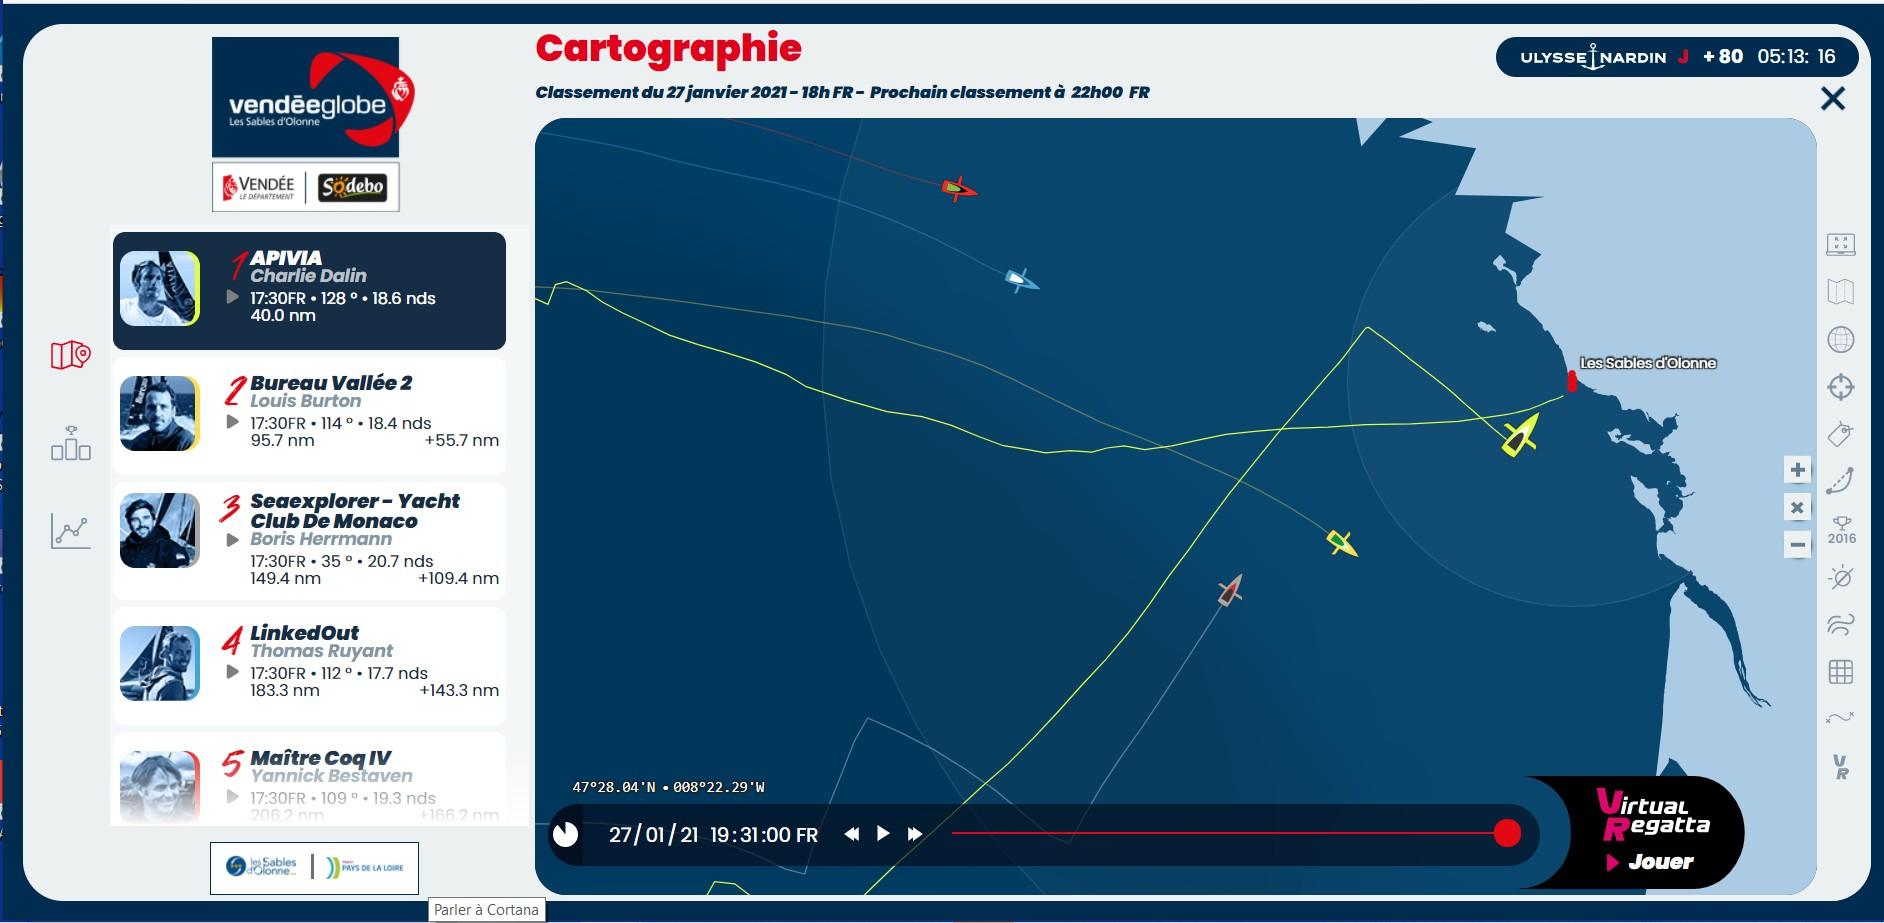 Vendée Globe virtuel: Virtual Regatta, édition 2020 - Page 2 Captur89